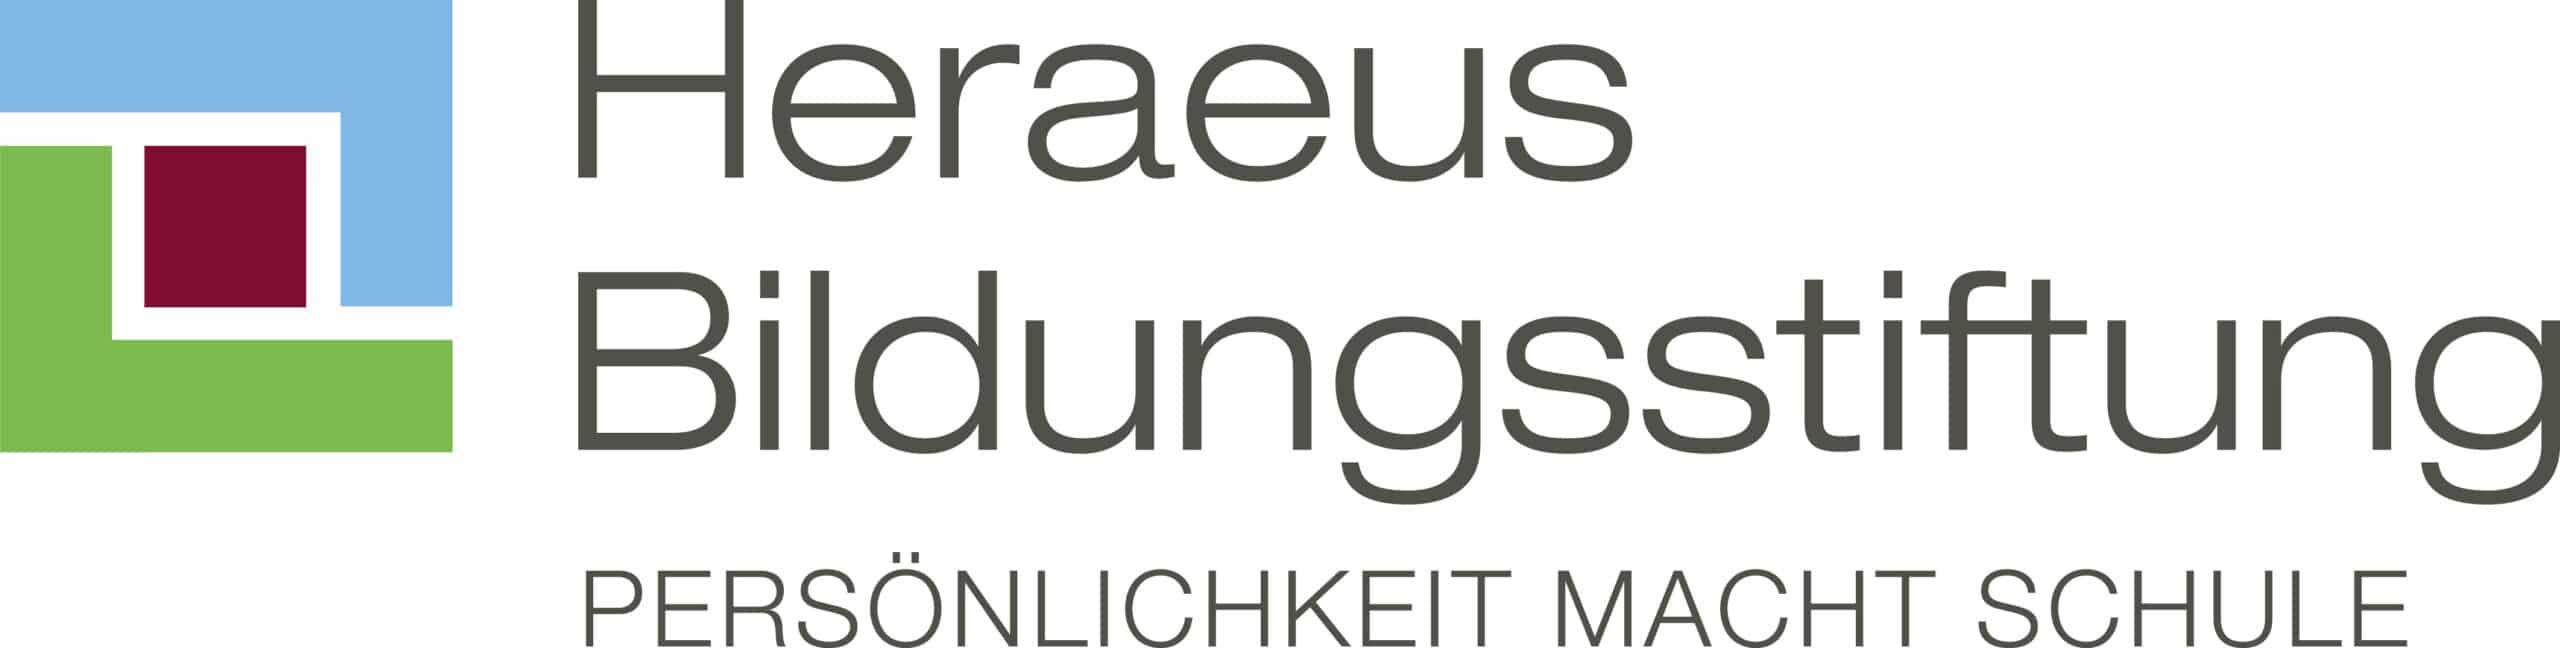 Heraeus Bildungsstiftung Logo